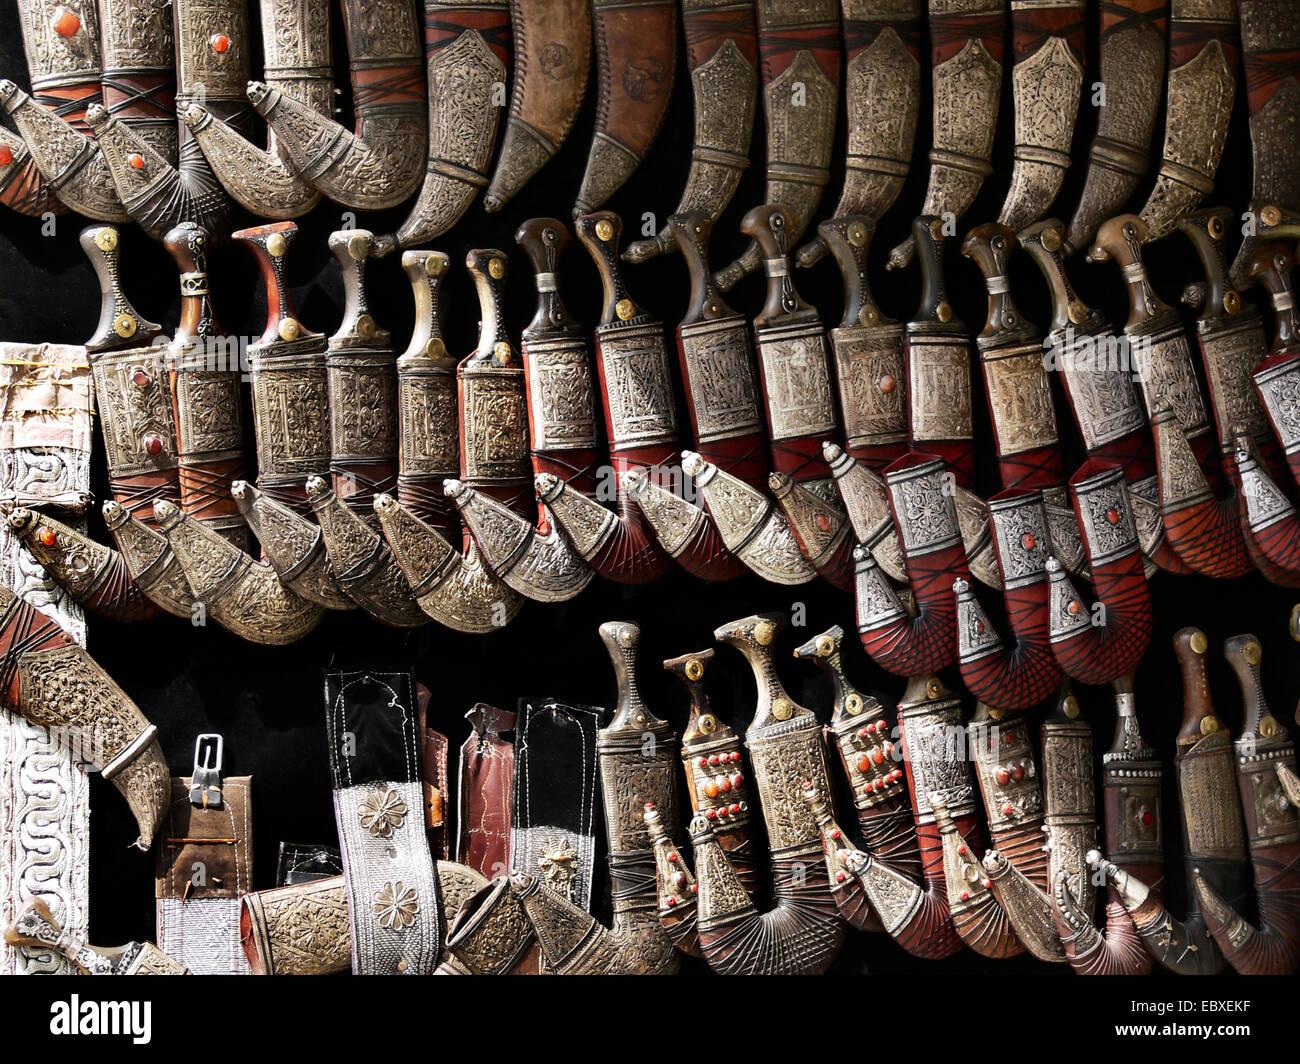 shop with daggers, jambiyas, Yemen, Sanaa - Stock Image